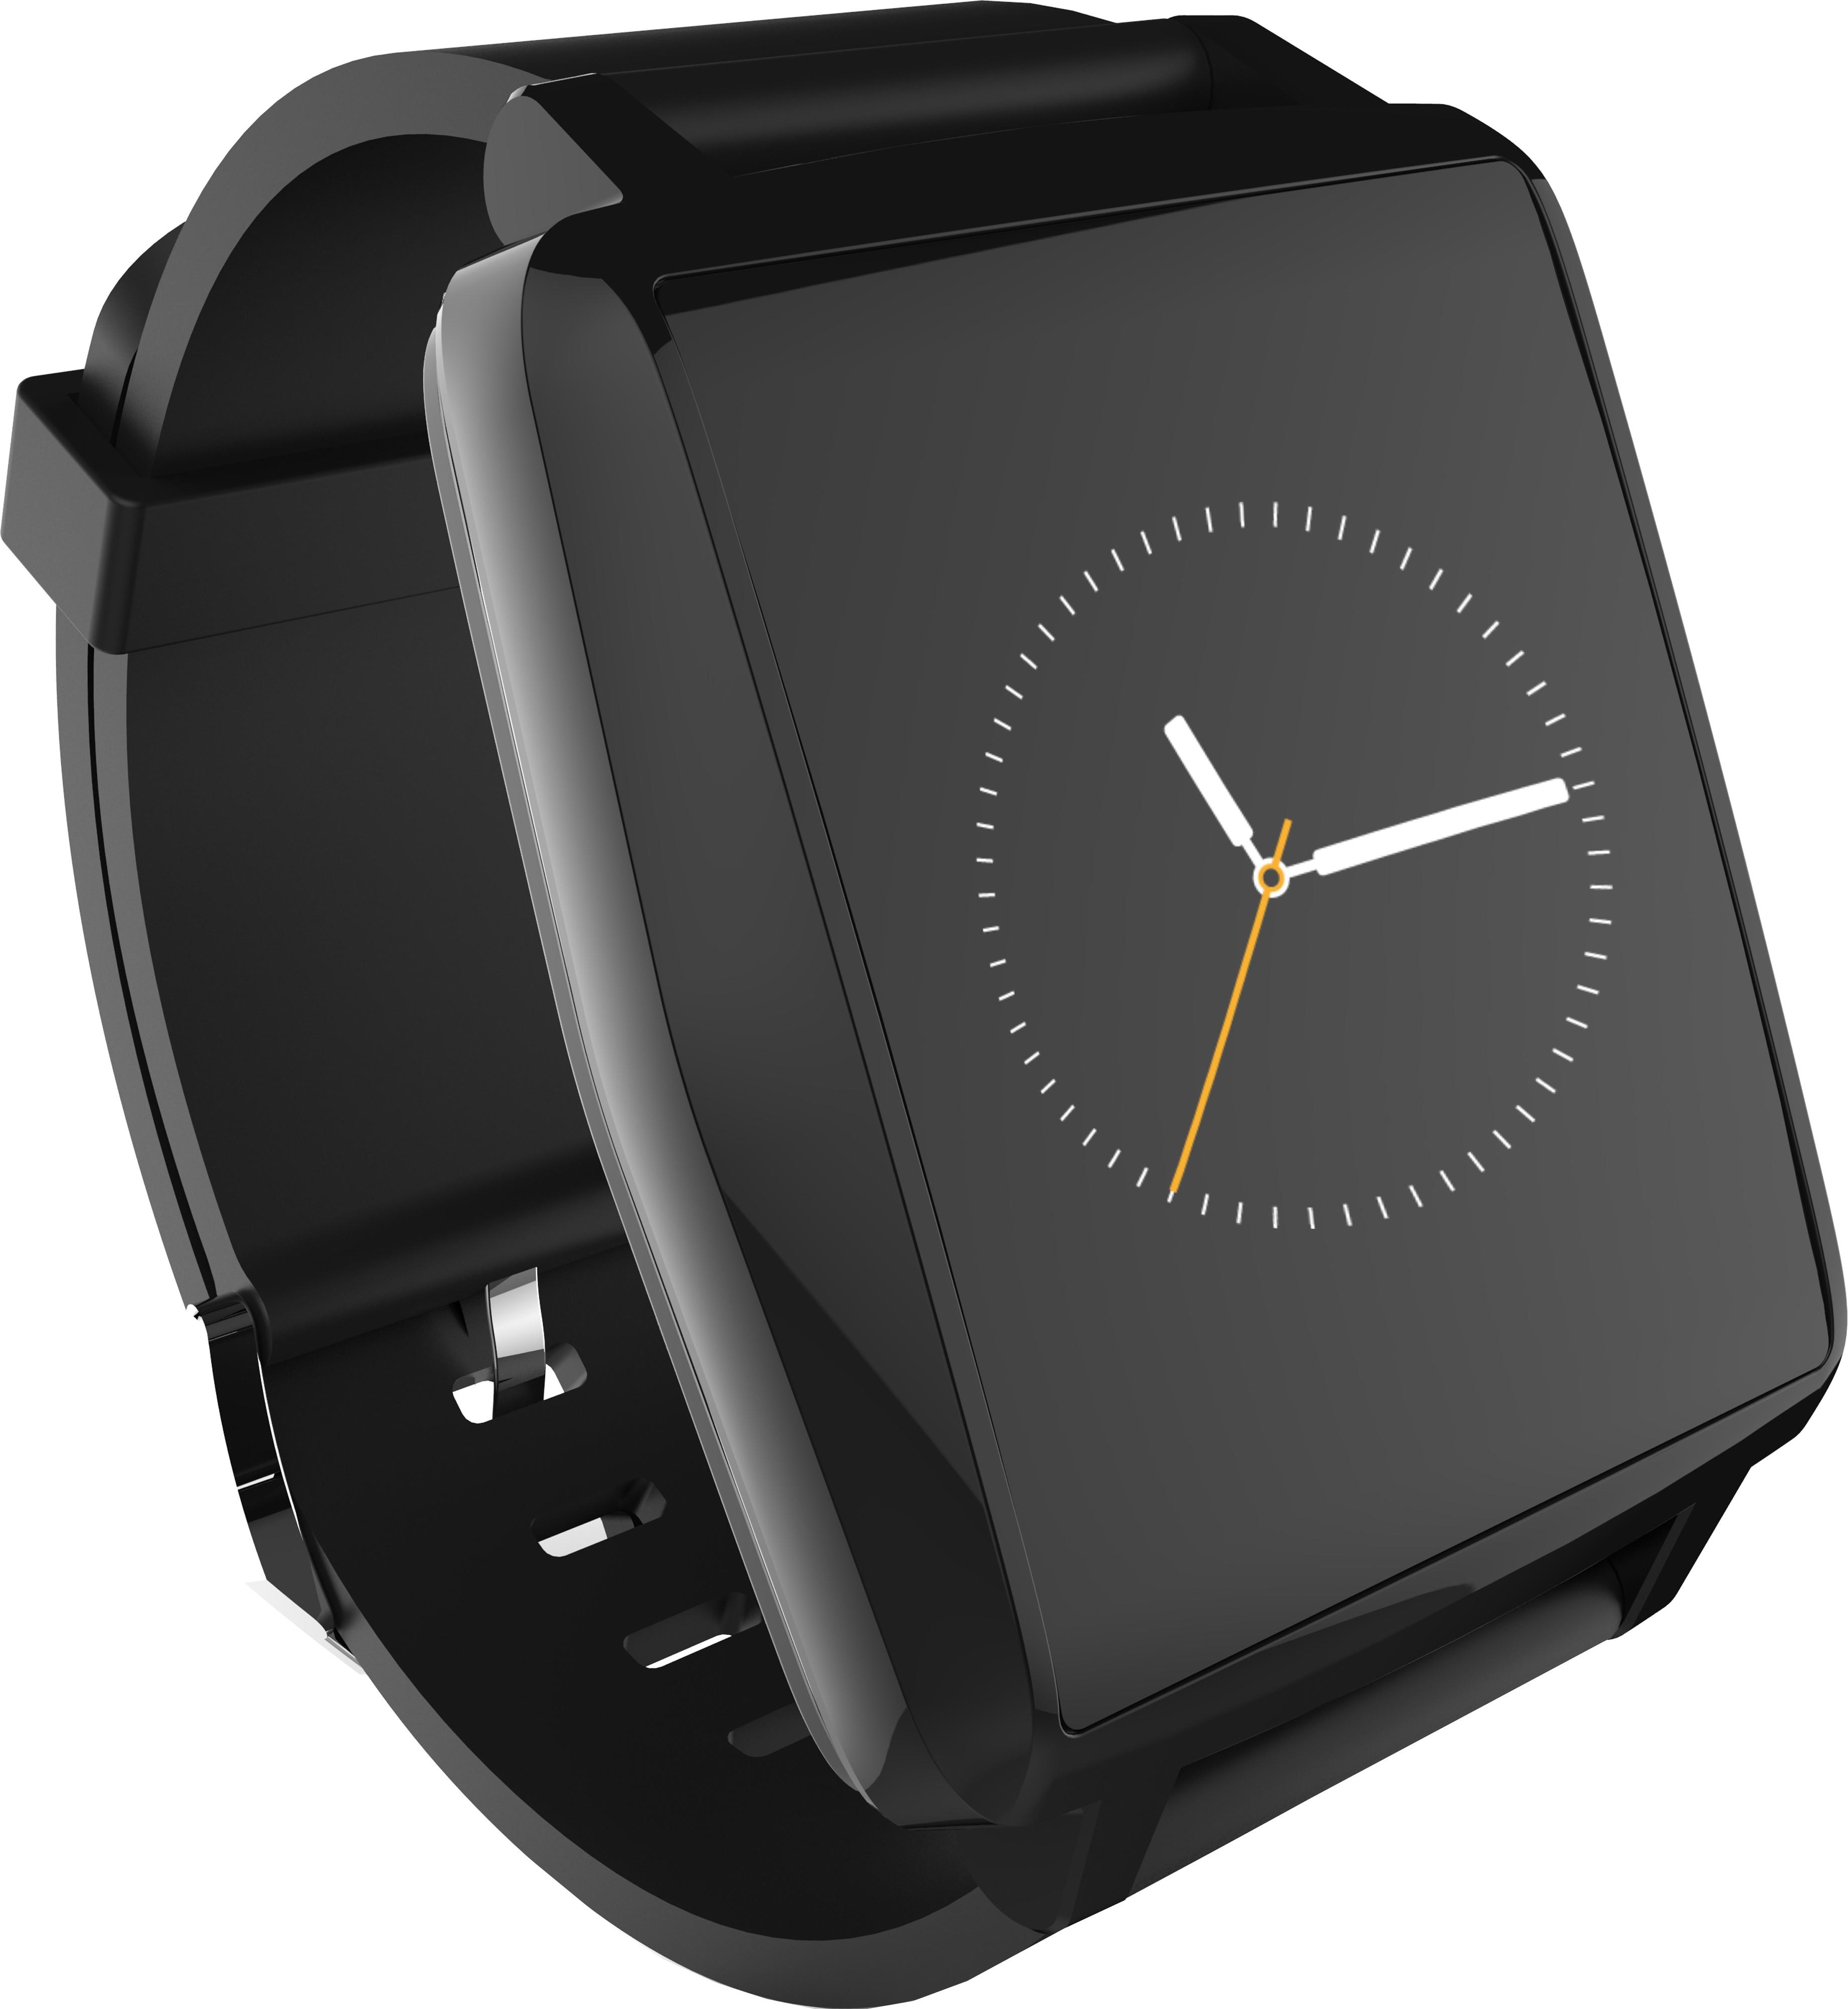 Deals - Jajpur - Intex IRIST PRO <br> Smartwatches<br> Category - wearable_smart_devices<br> Business - Flipkart.com